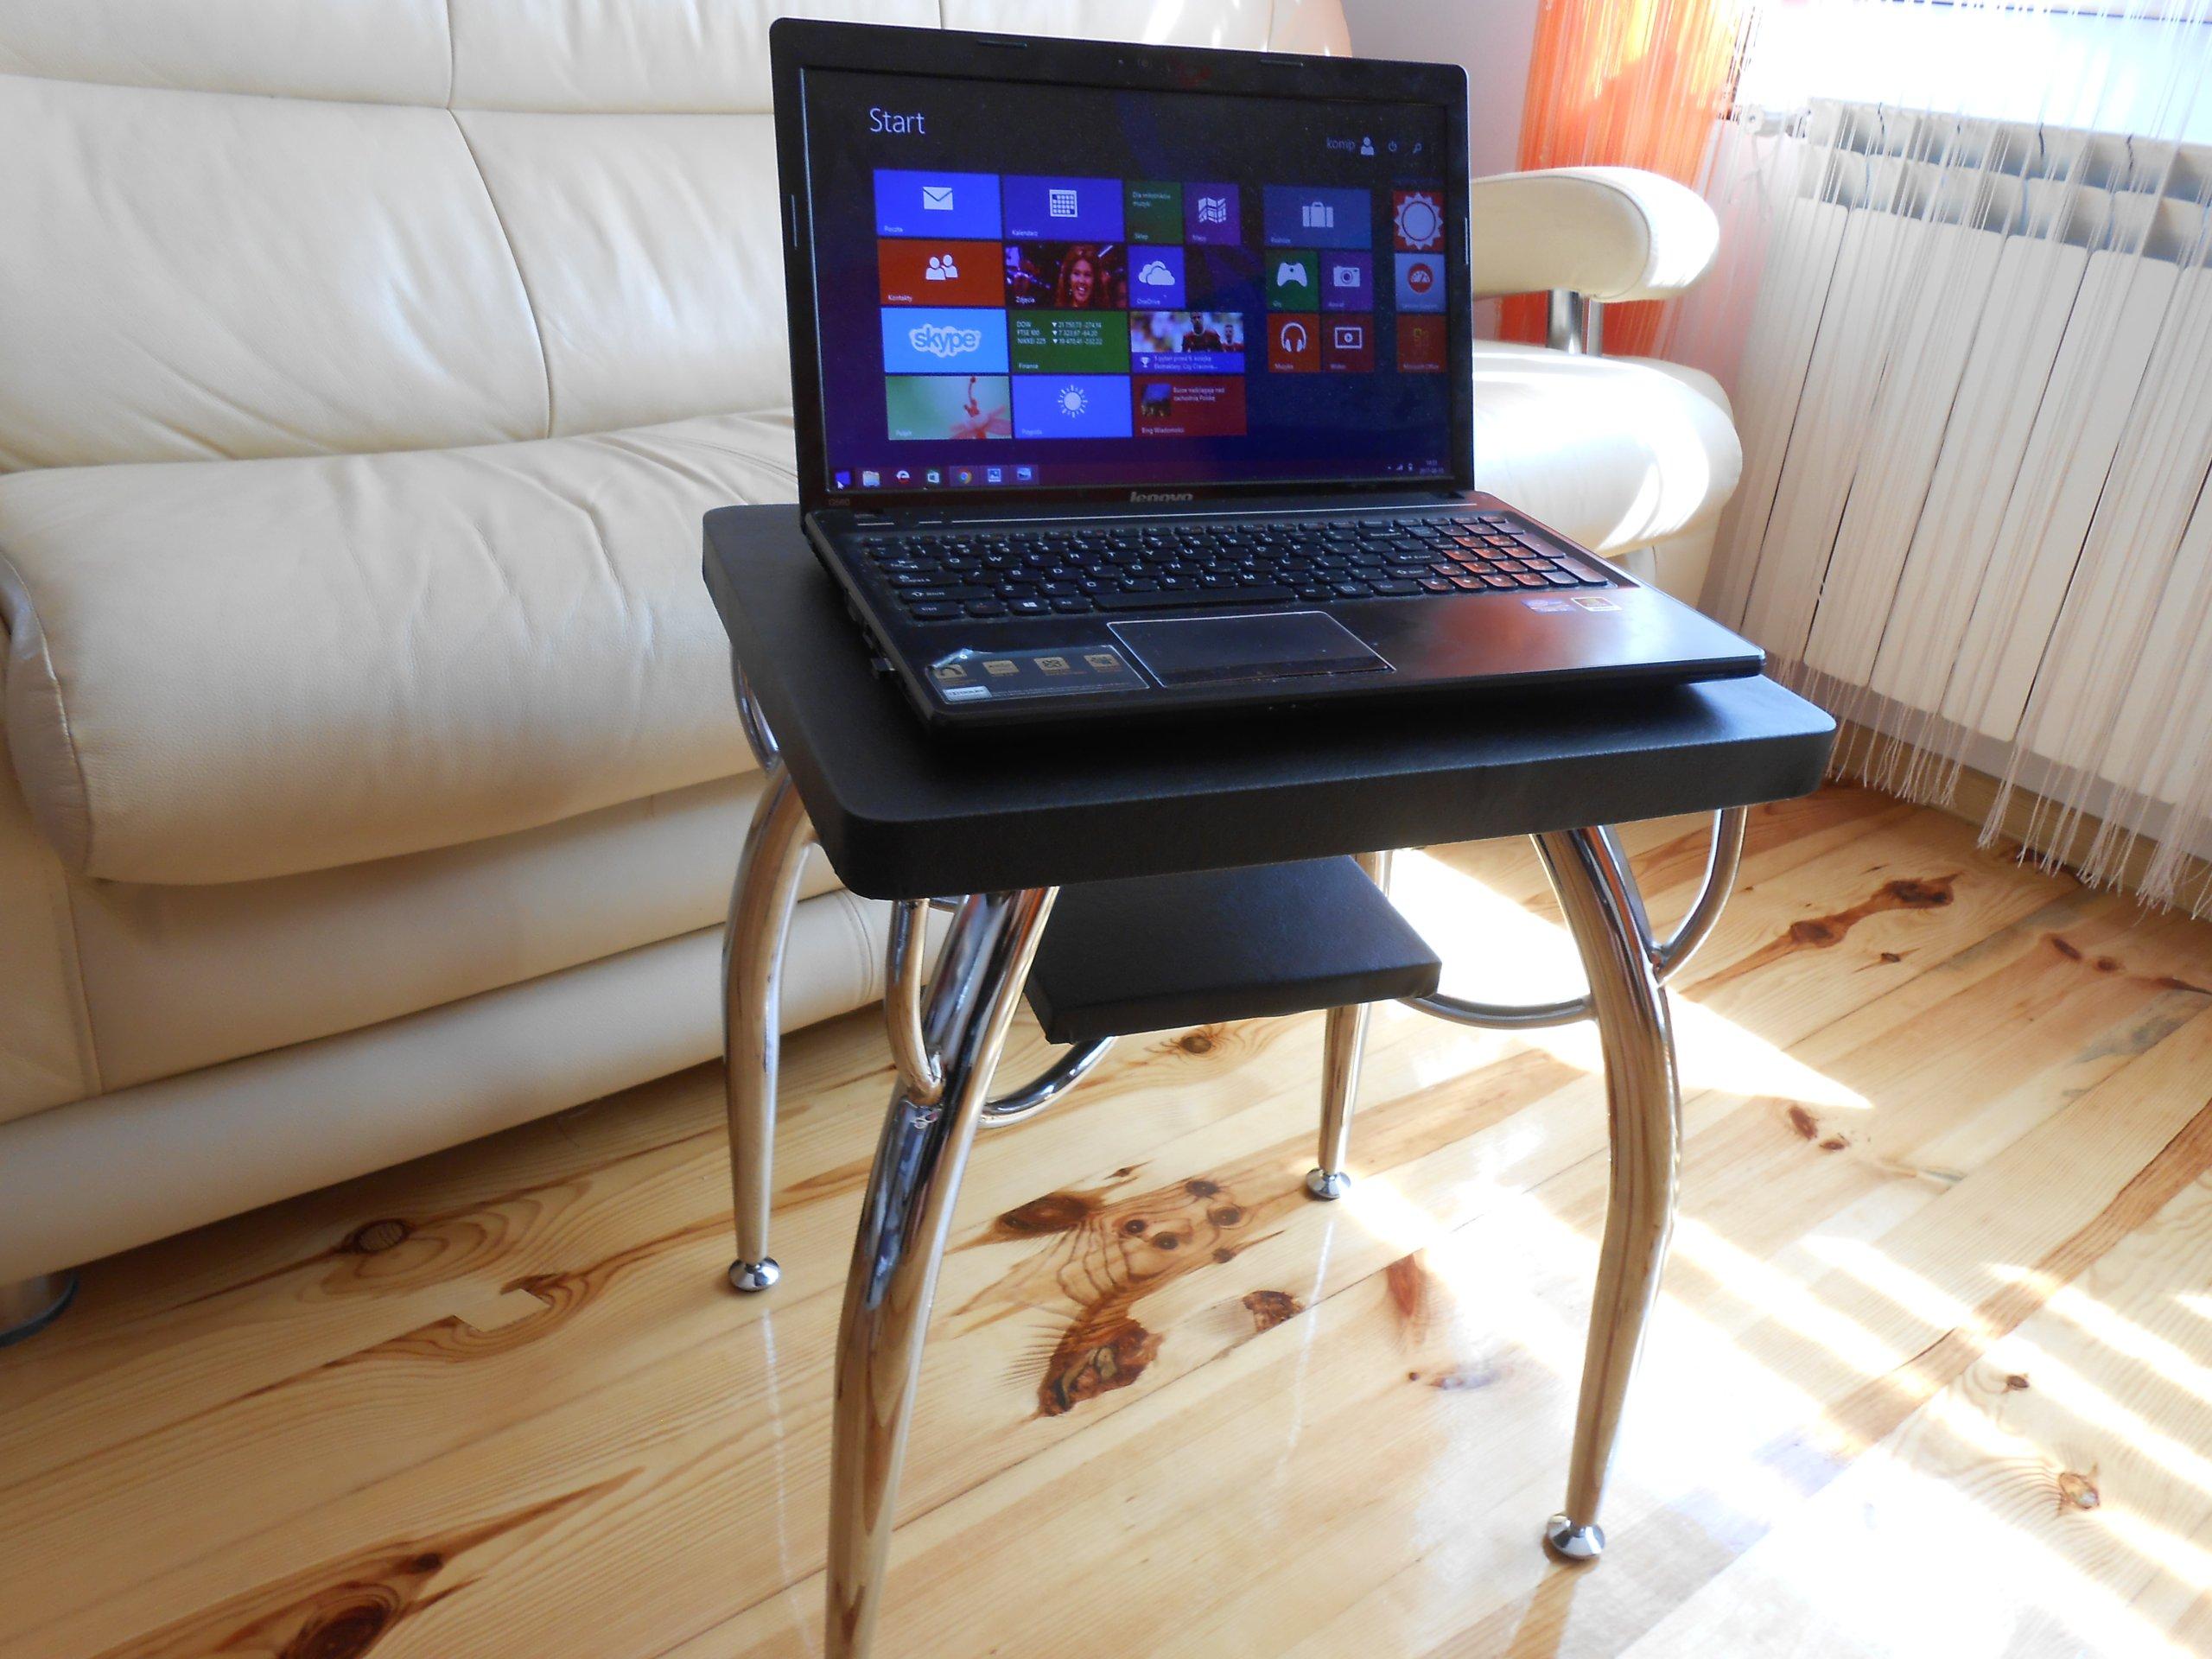 Ekskluzywny Stolik Pod Laptopa Czarny 7221529978 Oficjalne